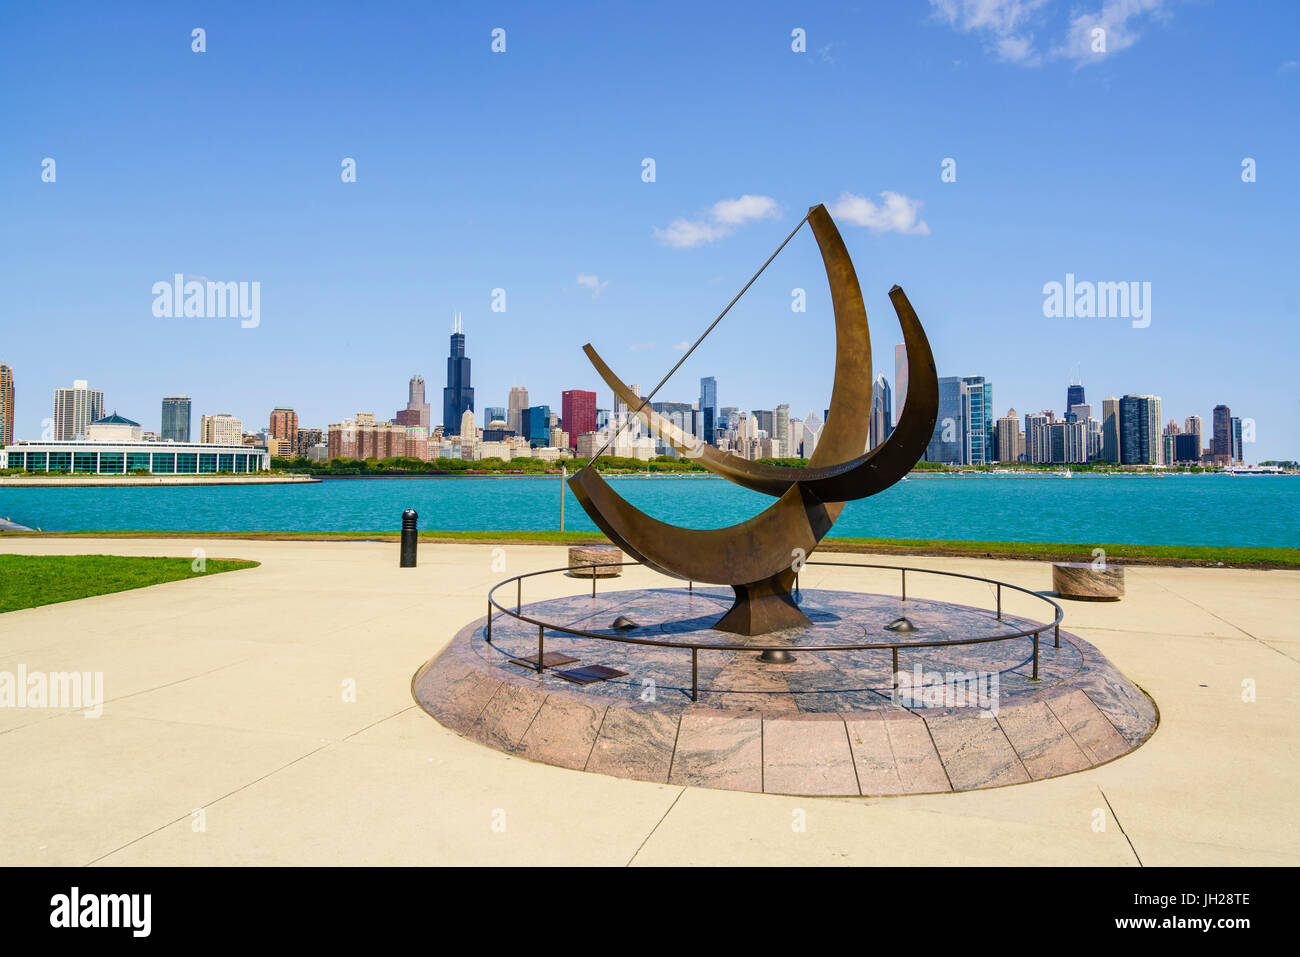 The Adler Planetarium sundial with Lake Michigan and city skyline beyond, Chicago, Illinois, United States of America - Stock Image